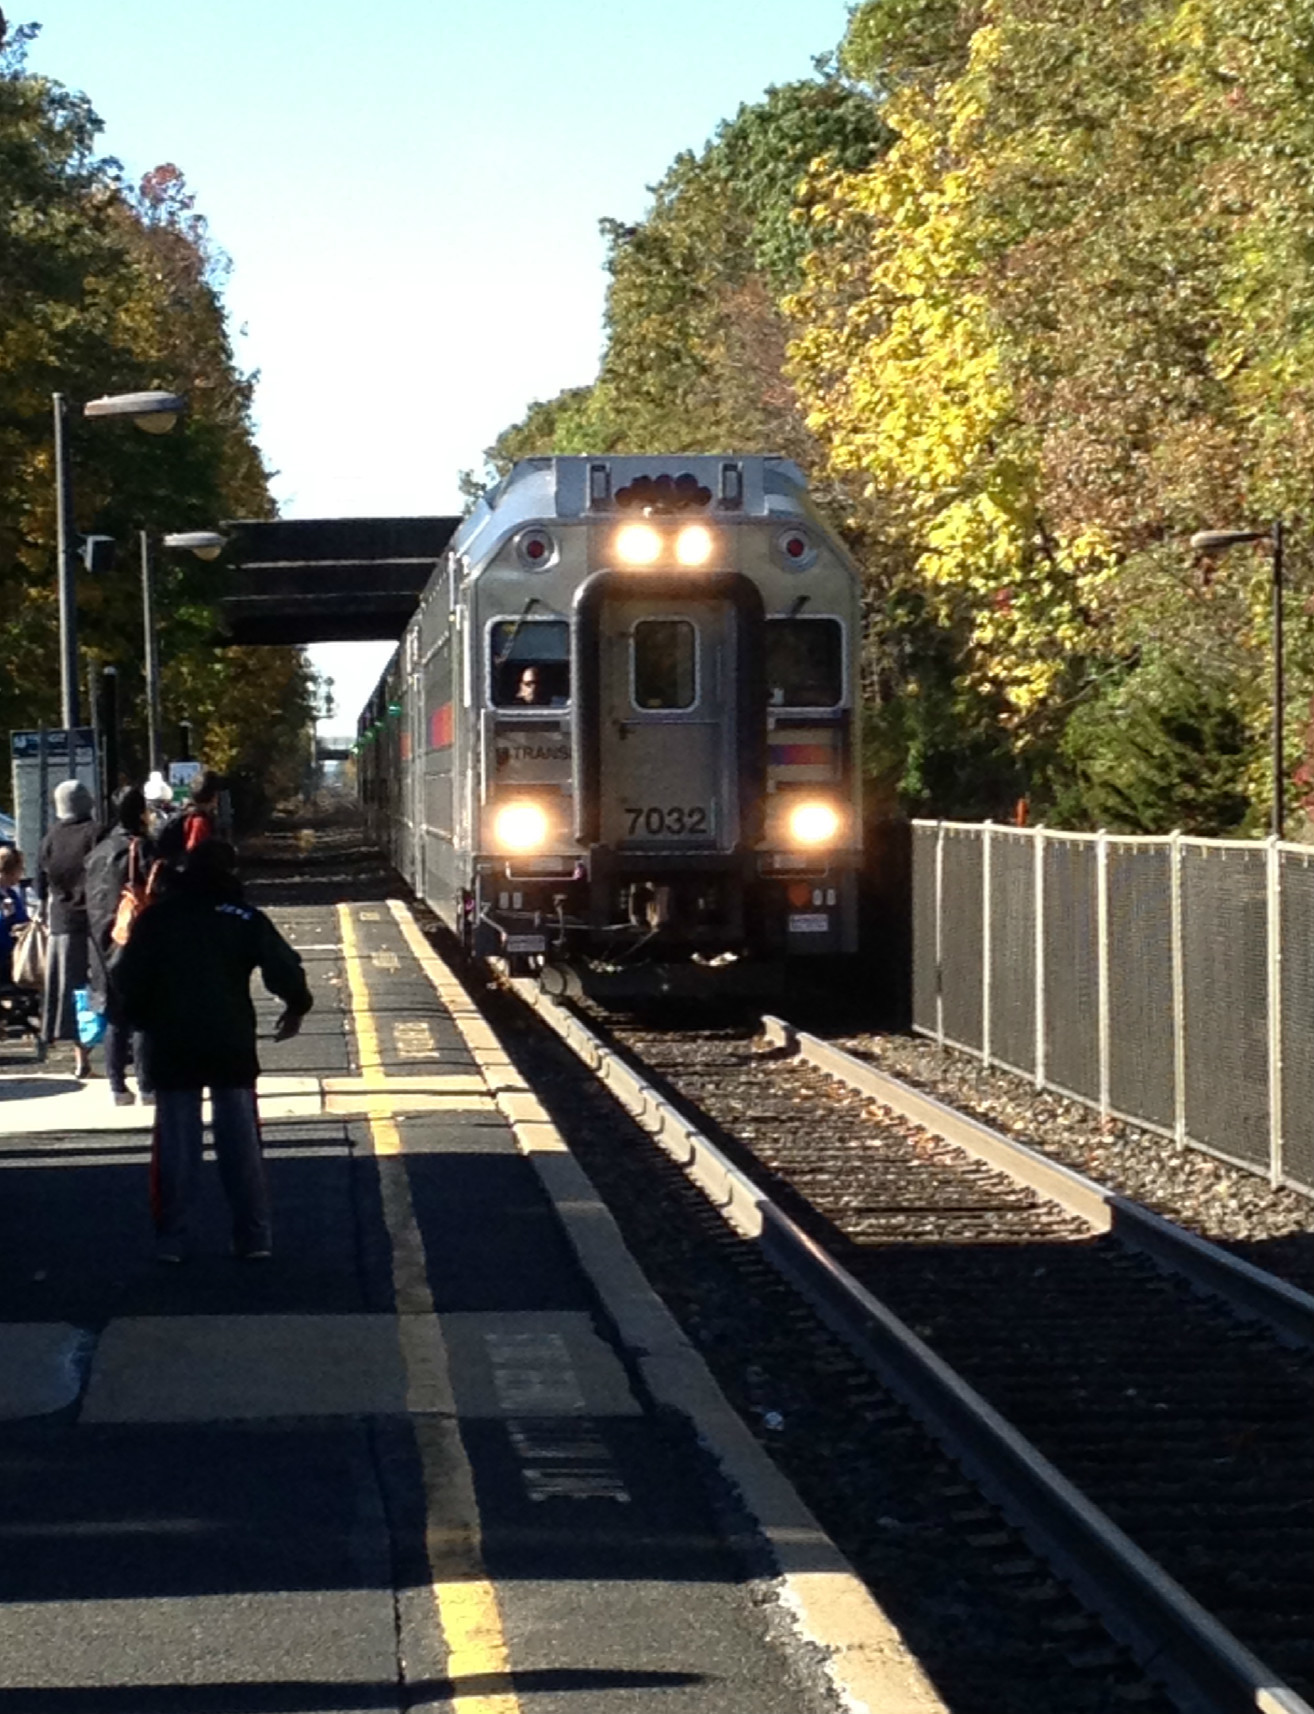 e9eb0e0c4e4322a63e74_NJT_1016am_train_pulls_into_Fanwood_10-27-14.jpg